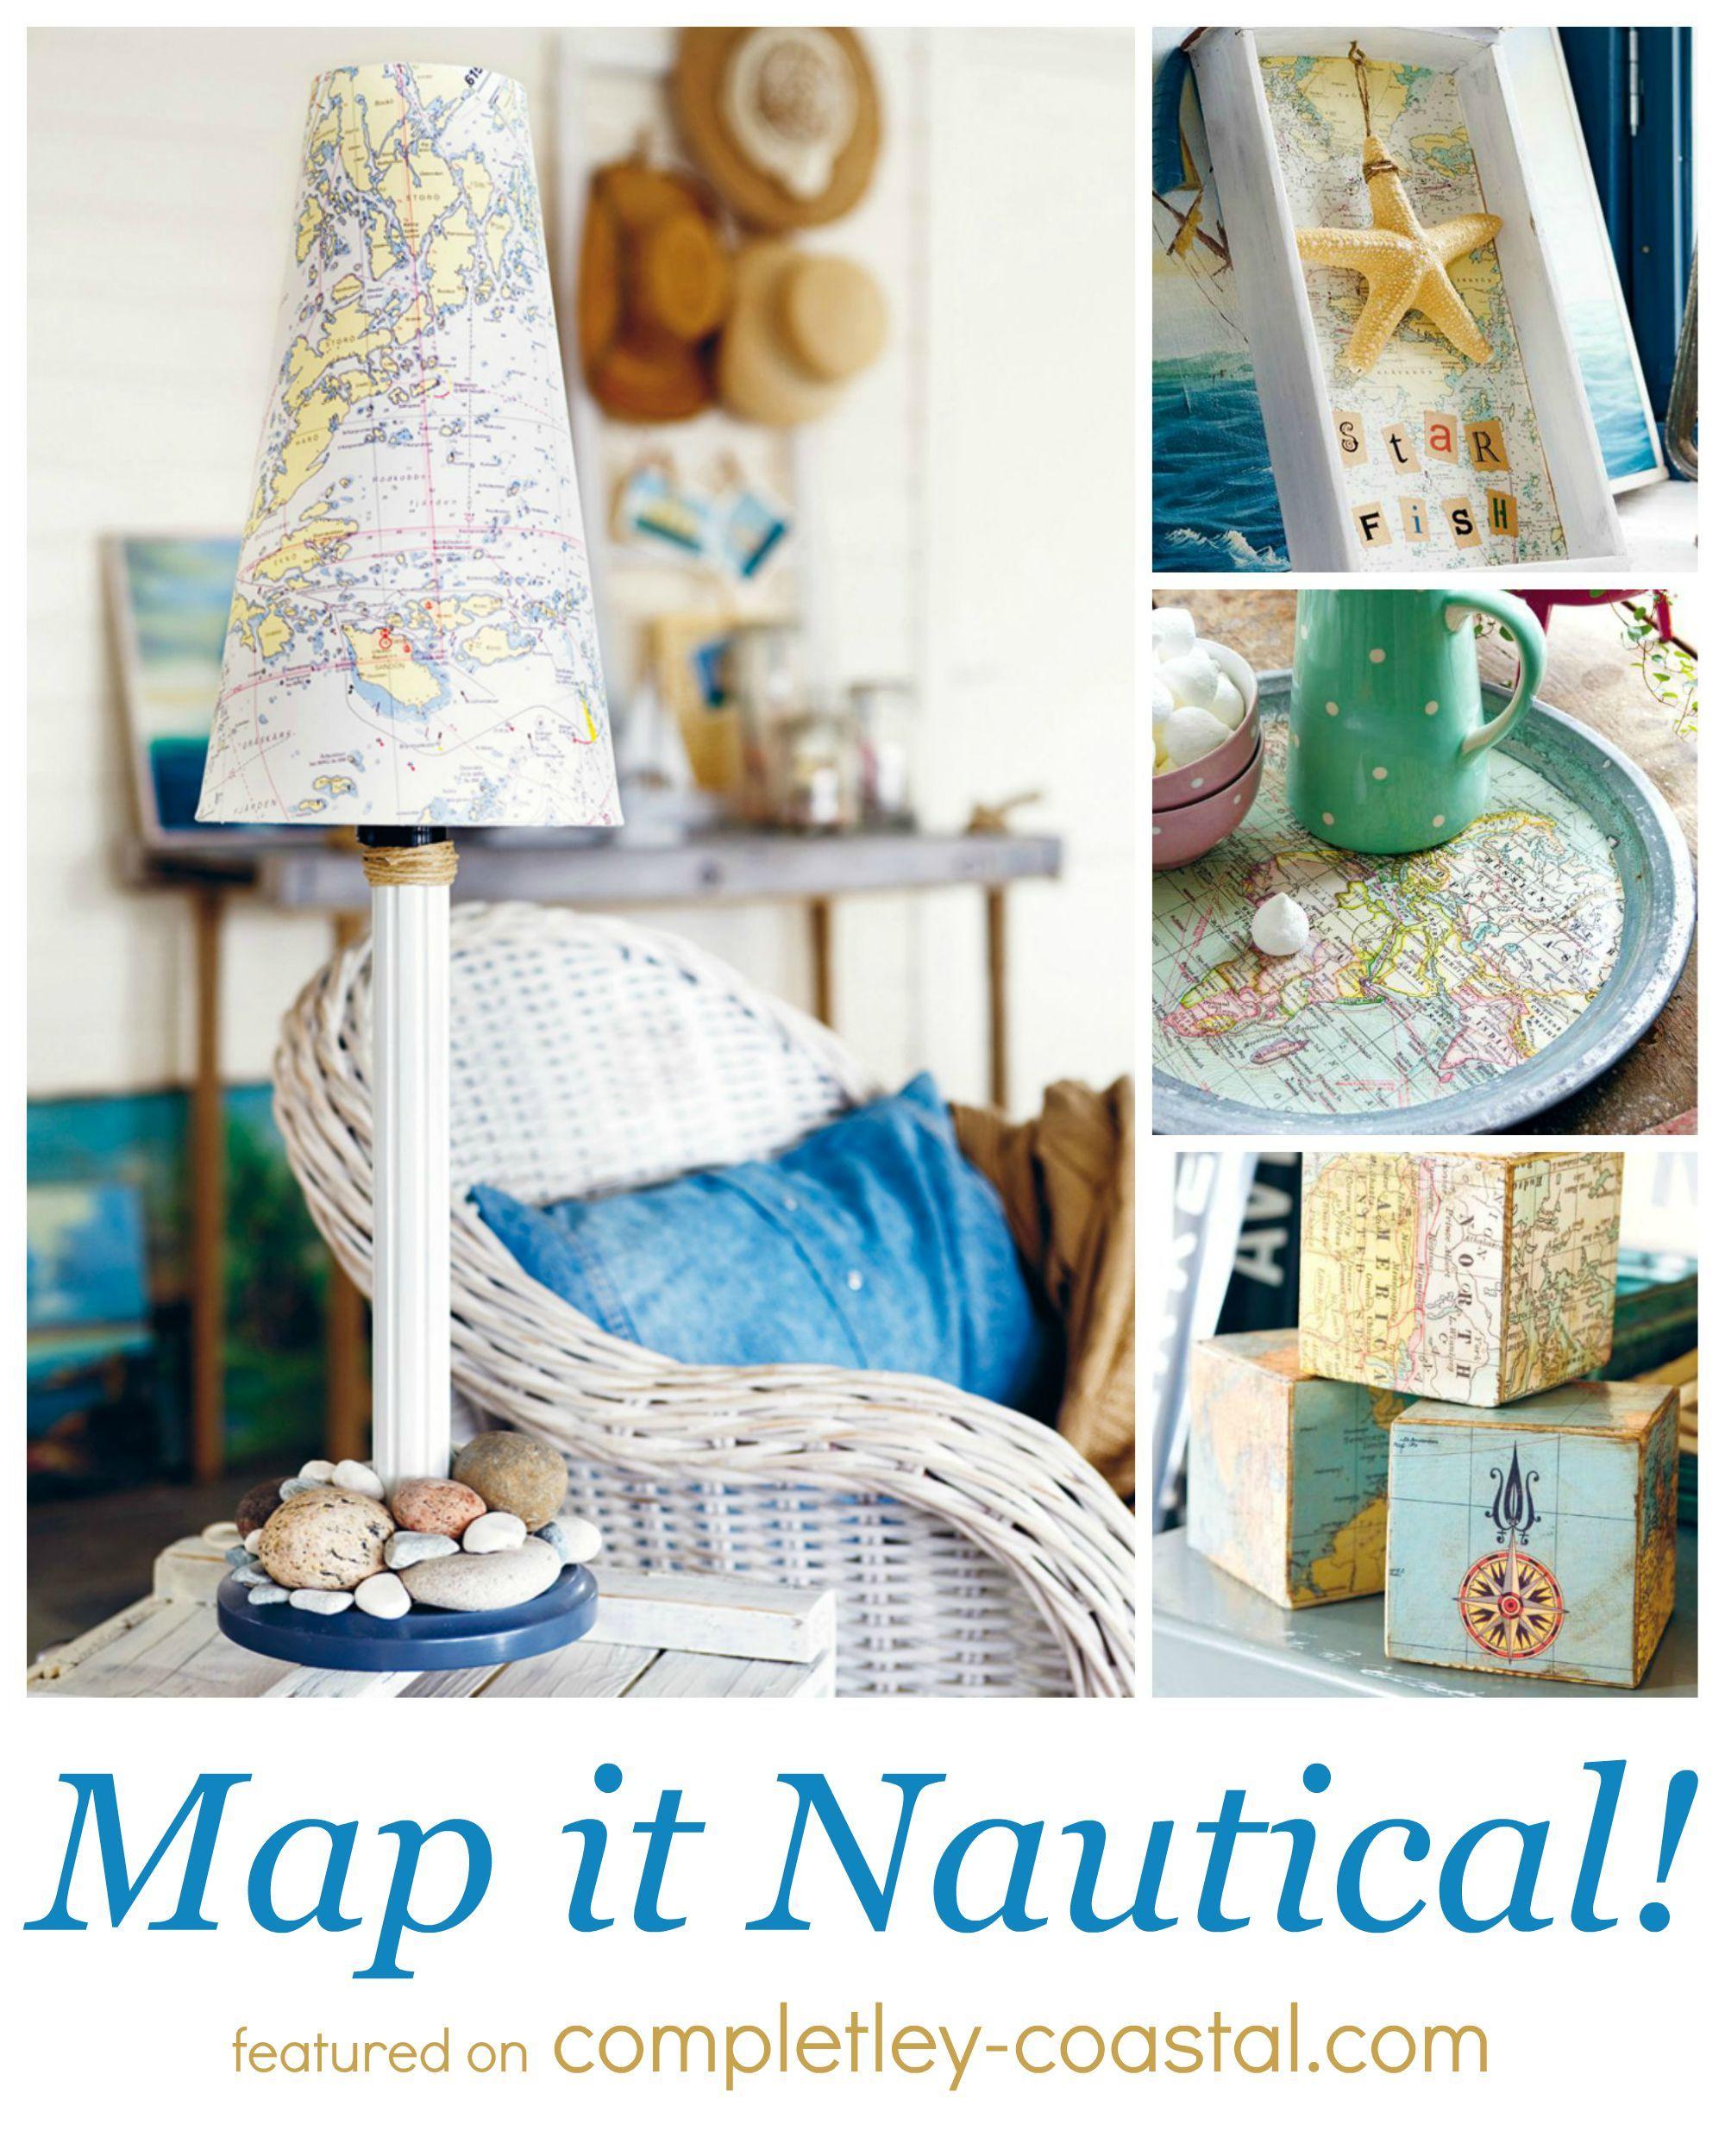 Diy Nautical Decor Ideas: 8 DIY Nautical Chart / Map Ideas From The Book The